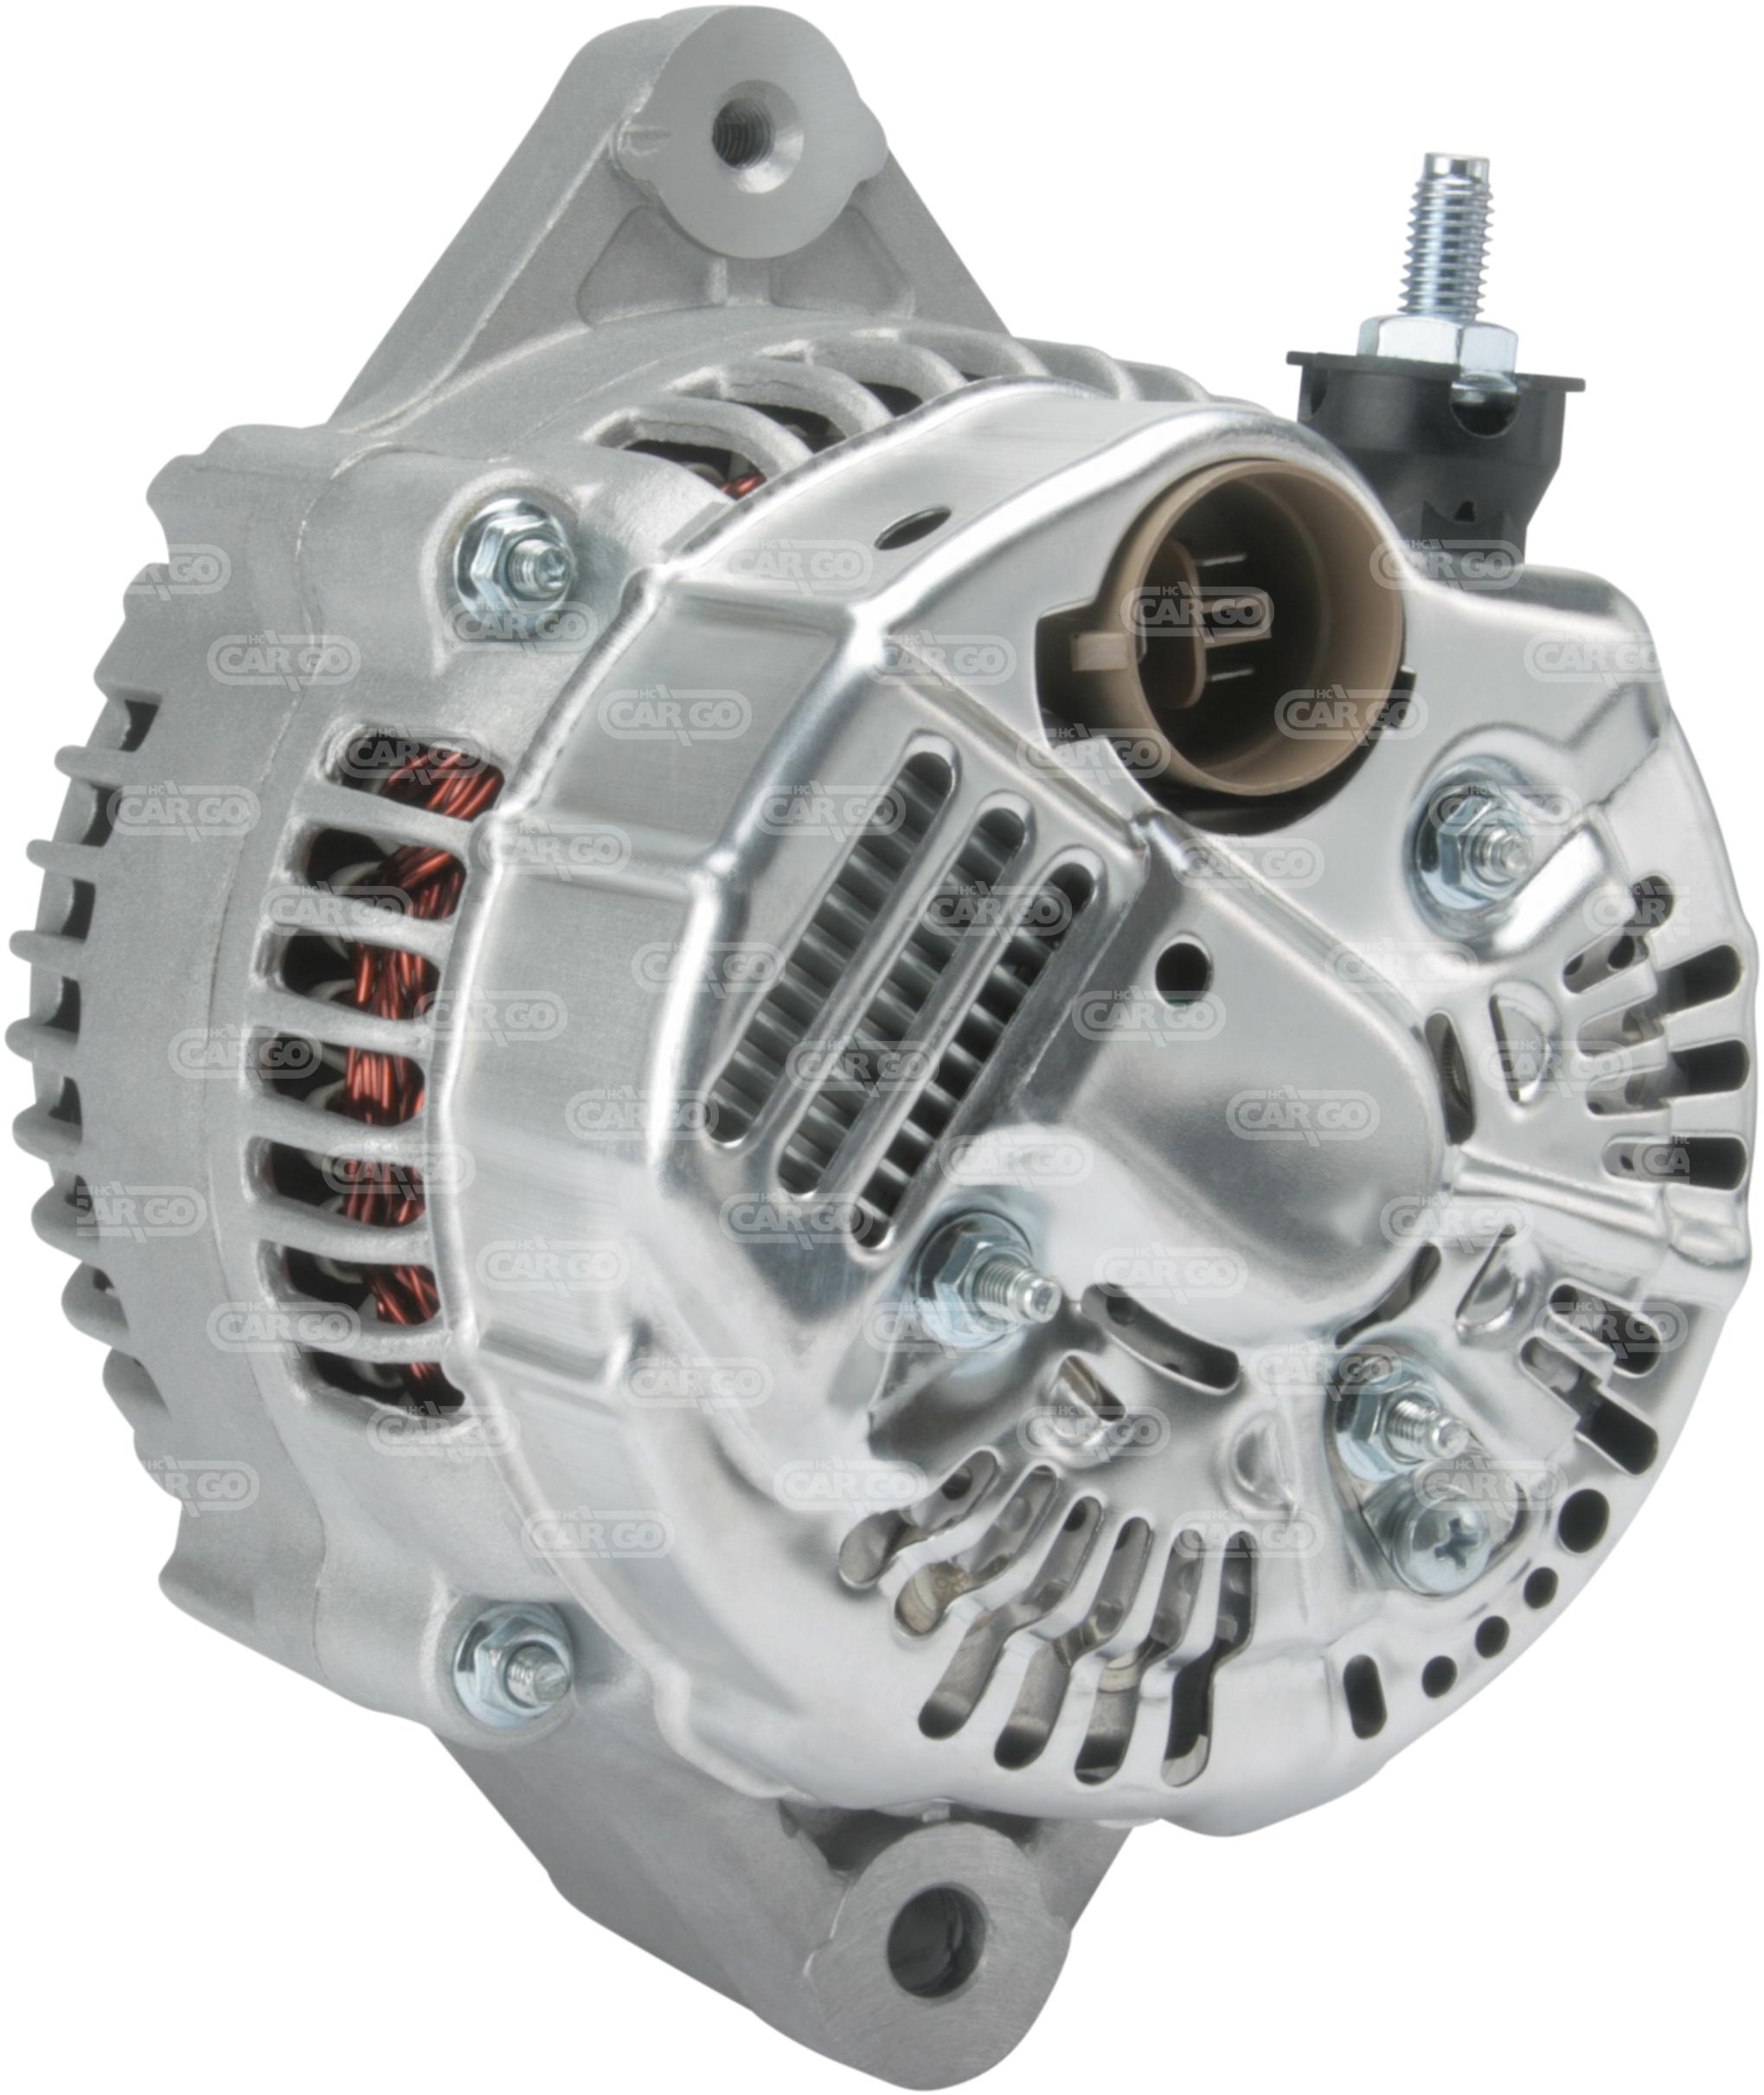 Alternateur 215 Voltage14 Amp120